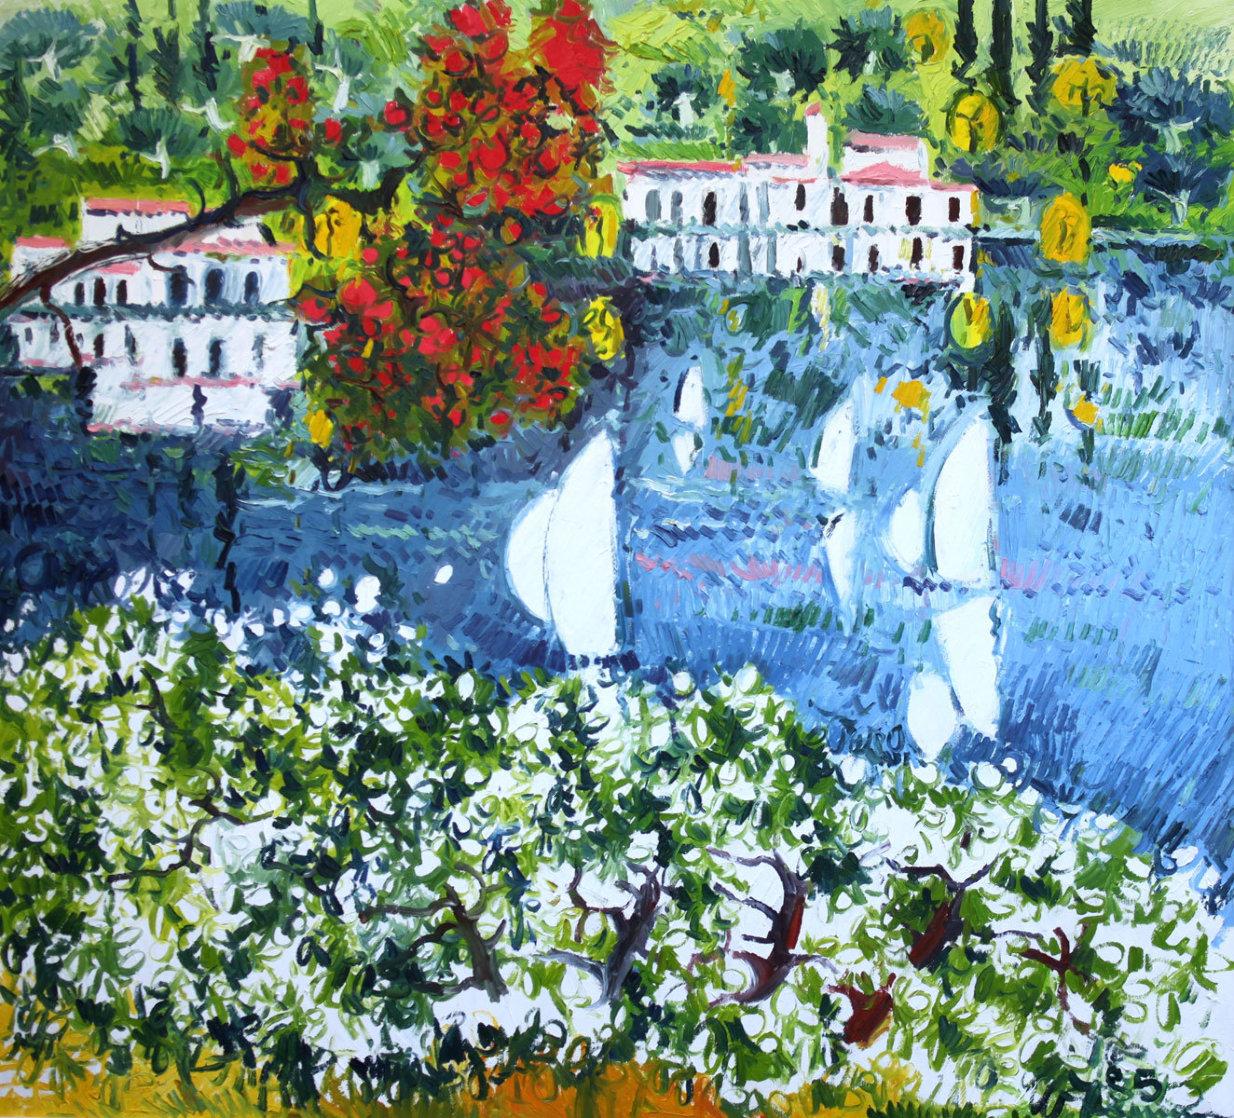 Saló Sul Lago Di Garda 1985 40x36 Super Huge Original Painting by Athos Faccincani